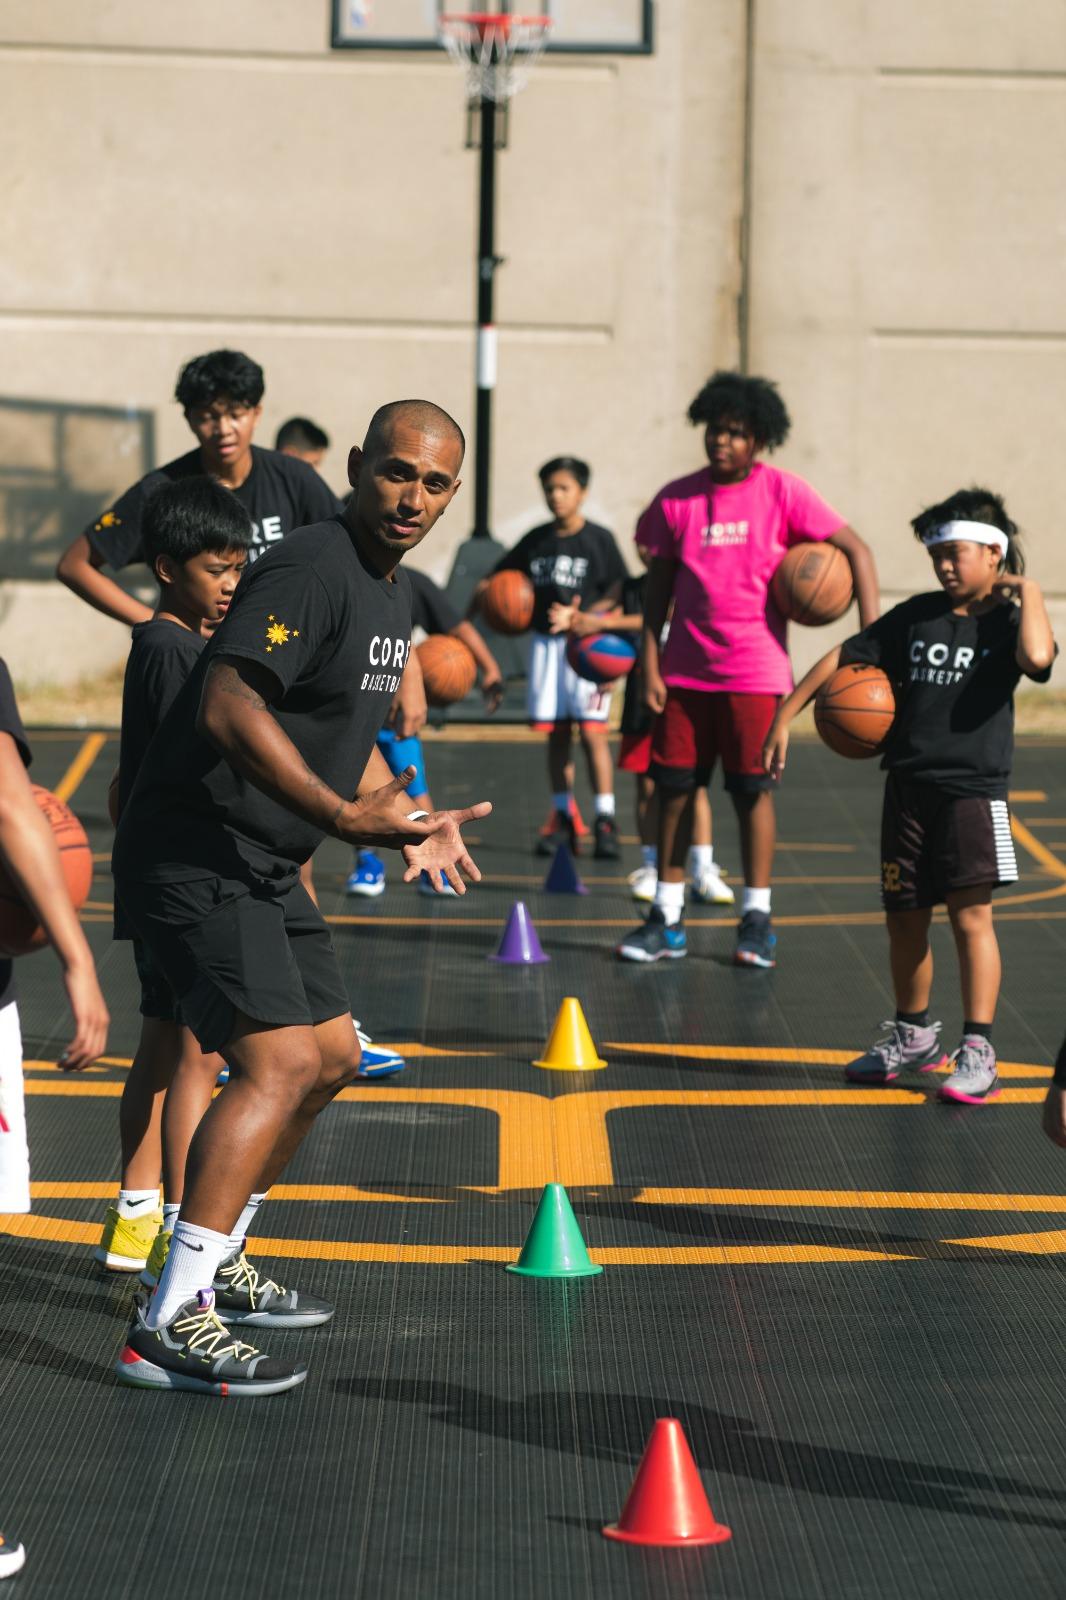 The Story of ALI NIZAM and Core Basketball